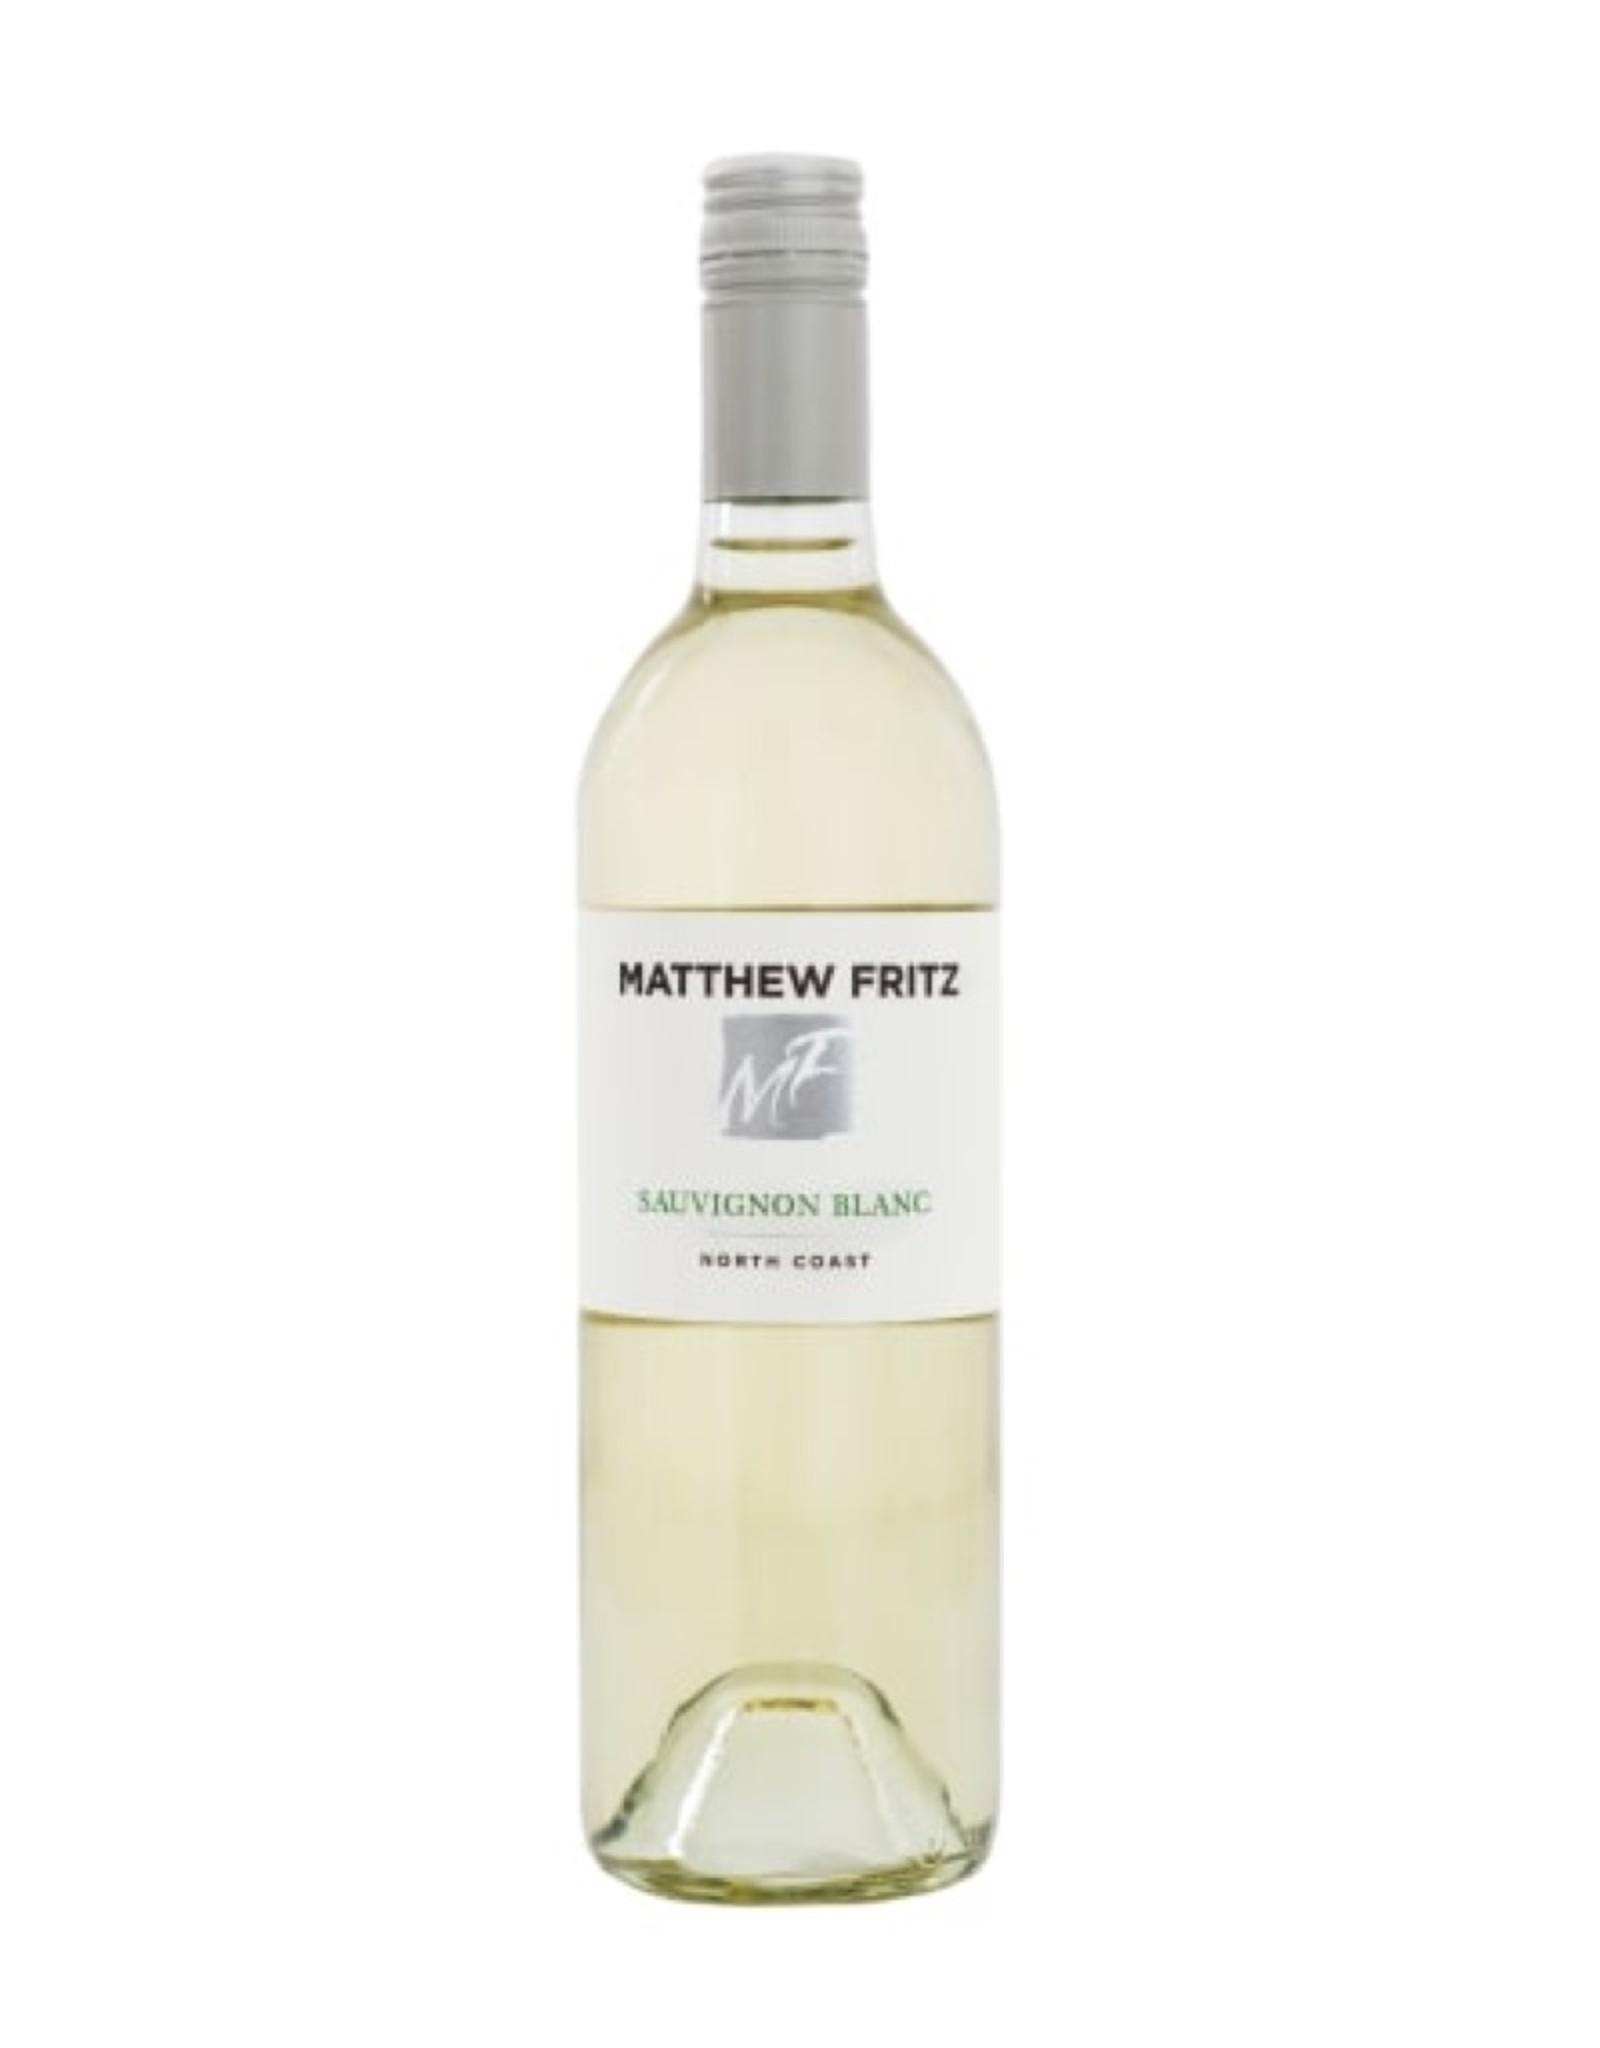 Matthew Fritz North Coast Sauvignon Blanc 2019